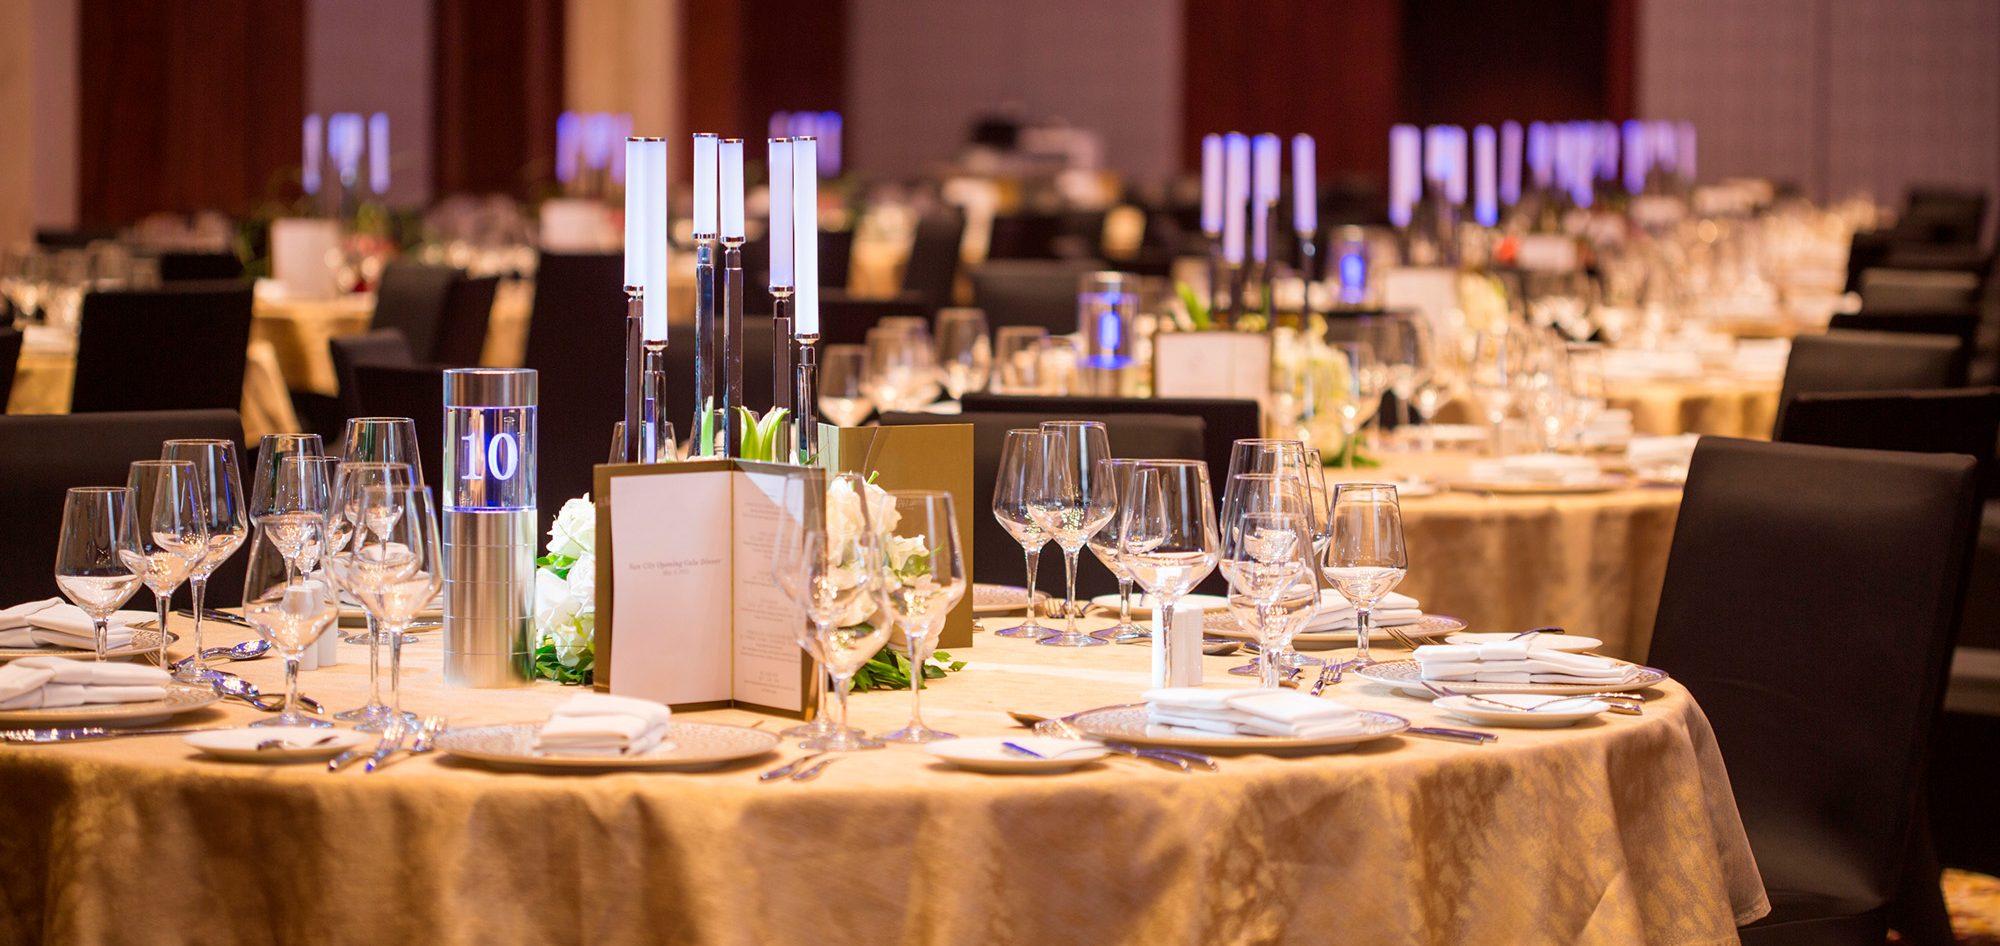 Conference & Banqueting Facilities